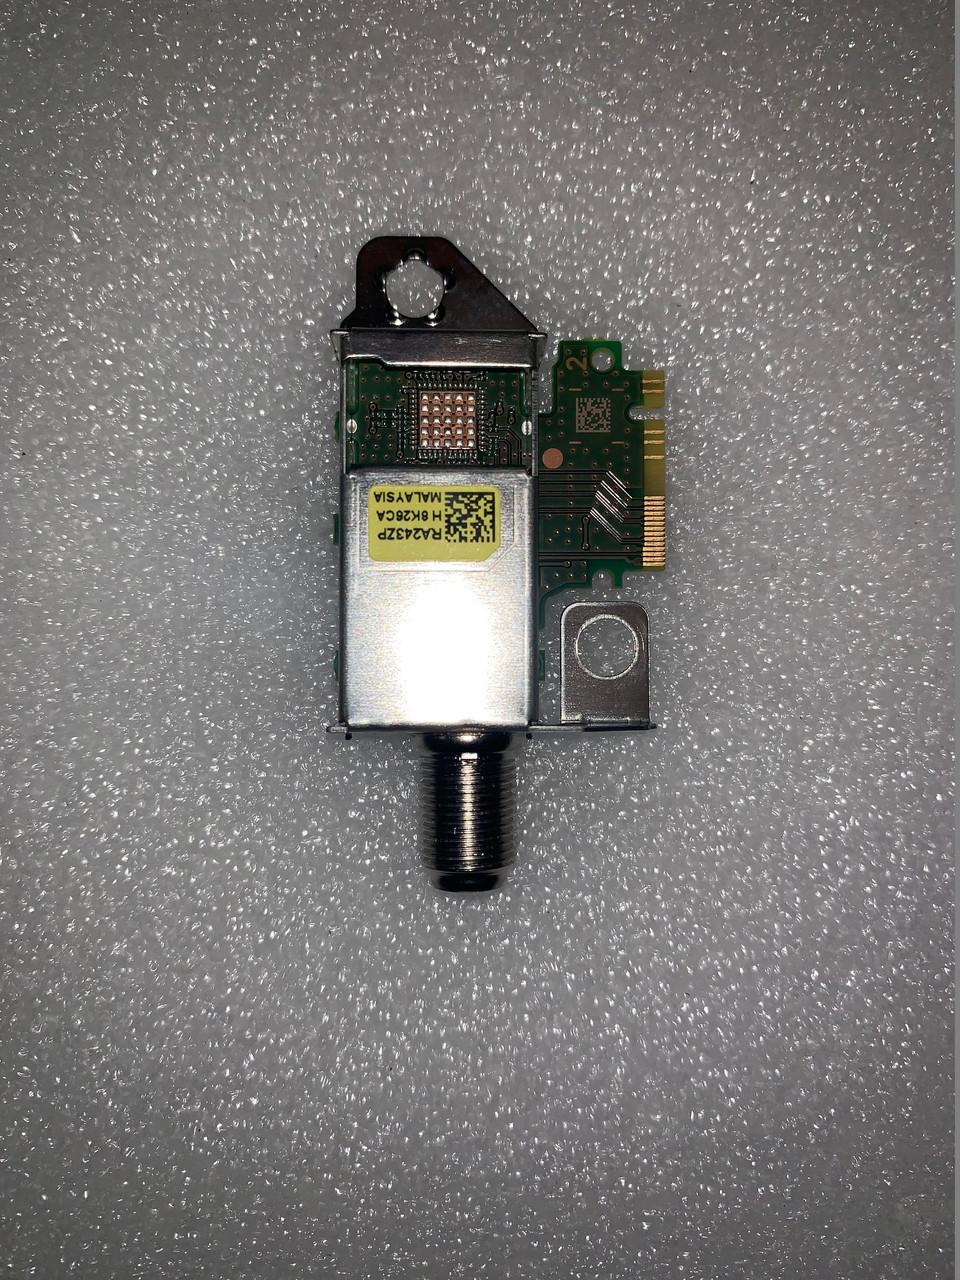 Sony XBR-49X800E TV Repair Kit A-2165-796-C / 6871L-4922A / A-2226-116-A / RA243ZP / 1-458-912-11